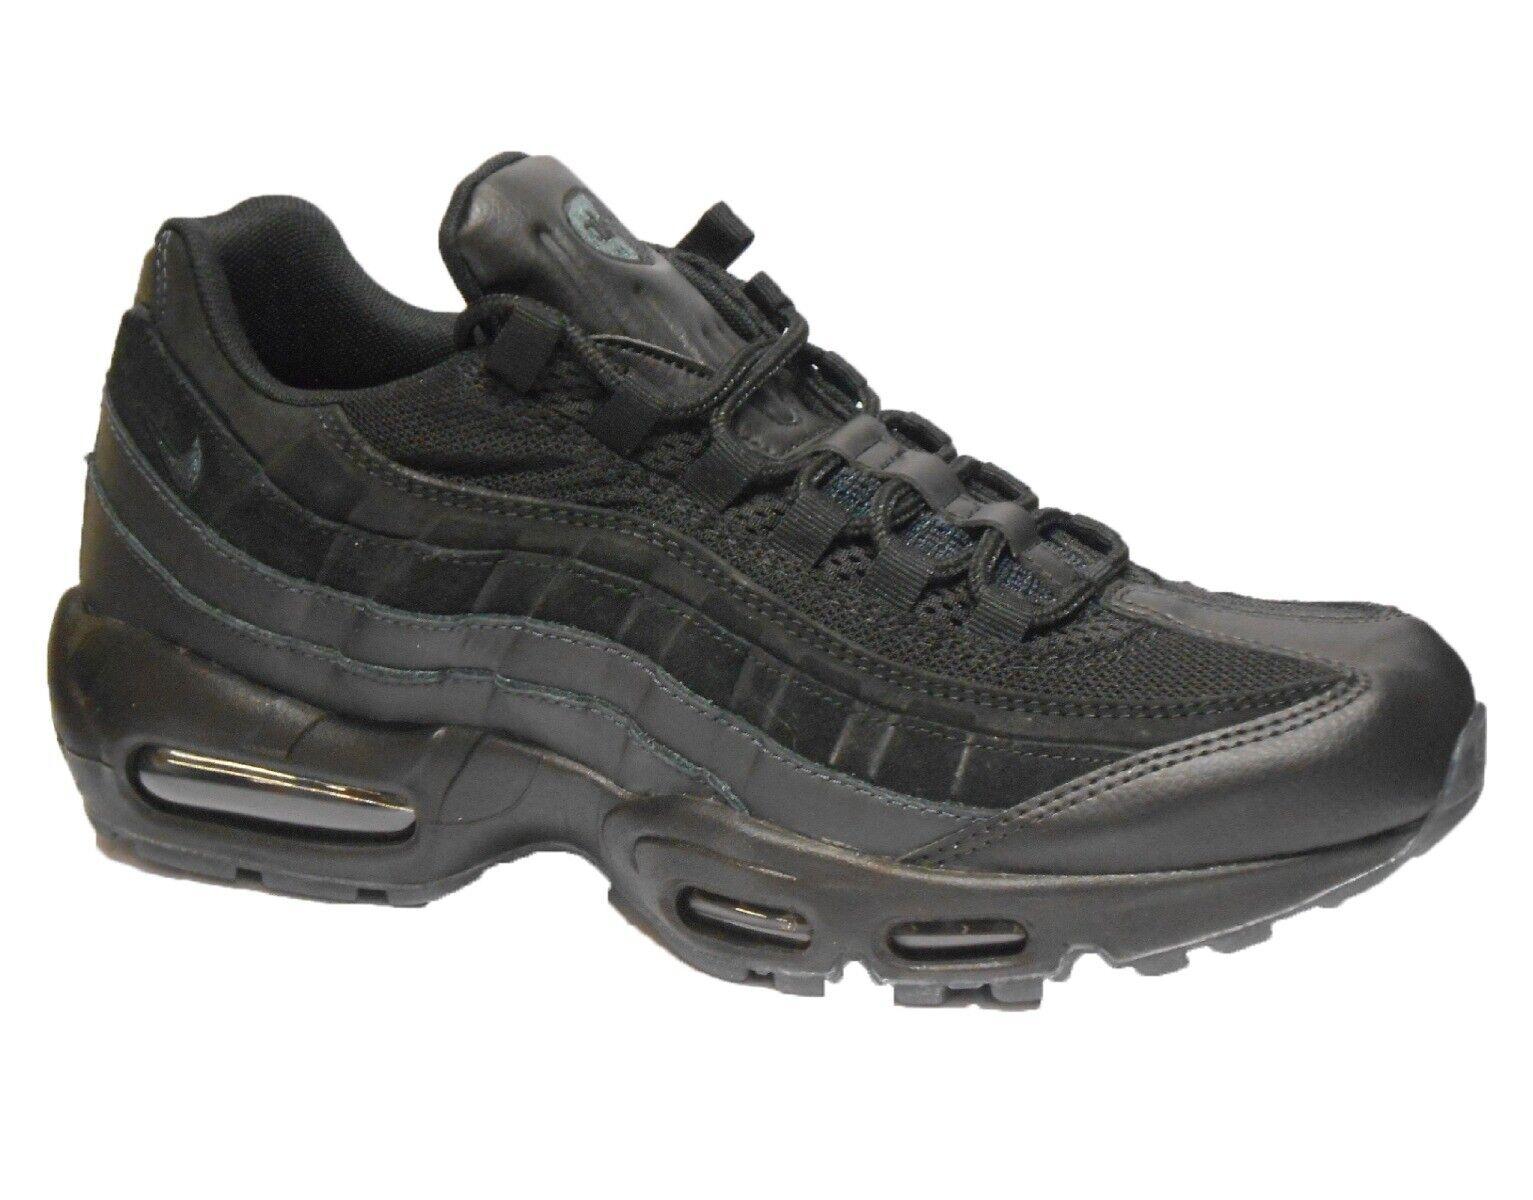 662cb8381e Nike Max 95 Running Zapatillas Número 8 9 black Hombre Air  ntifcr4036-Athletic Shoes